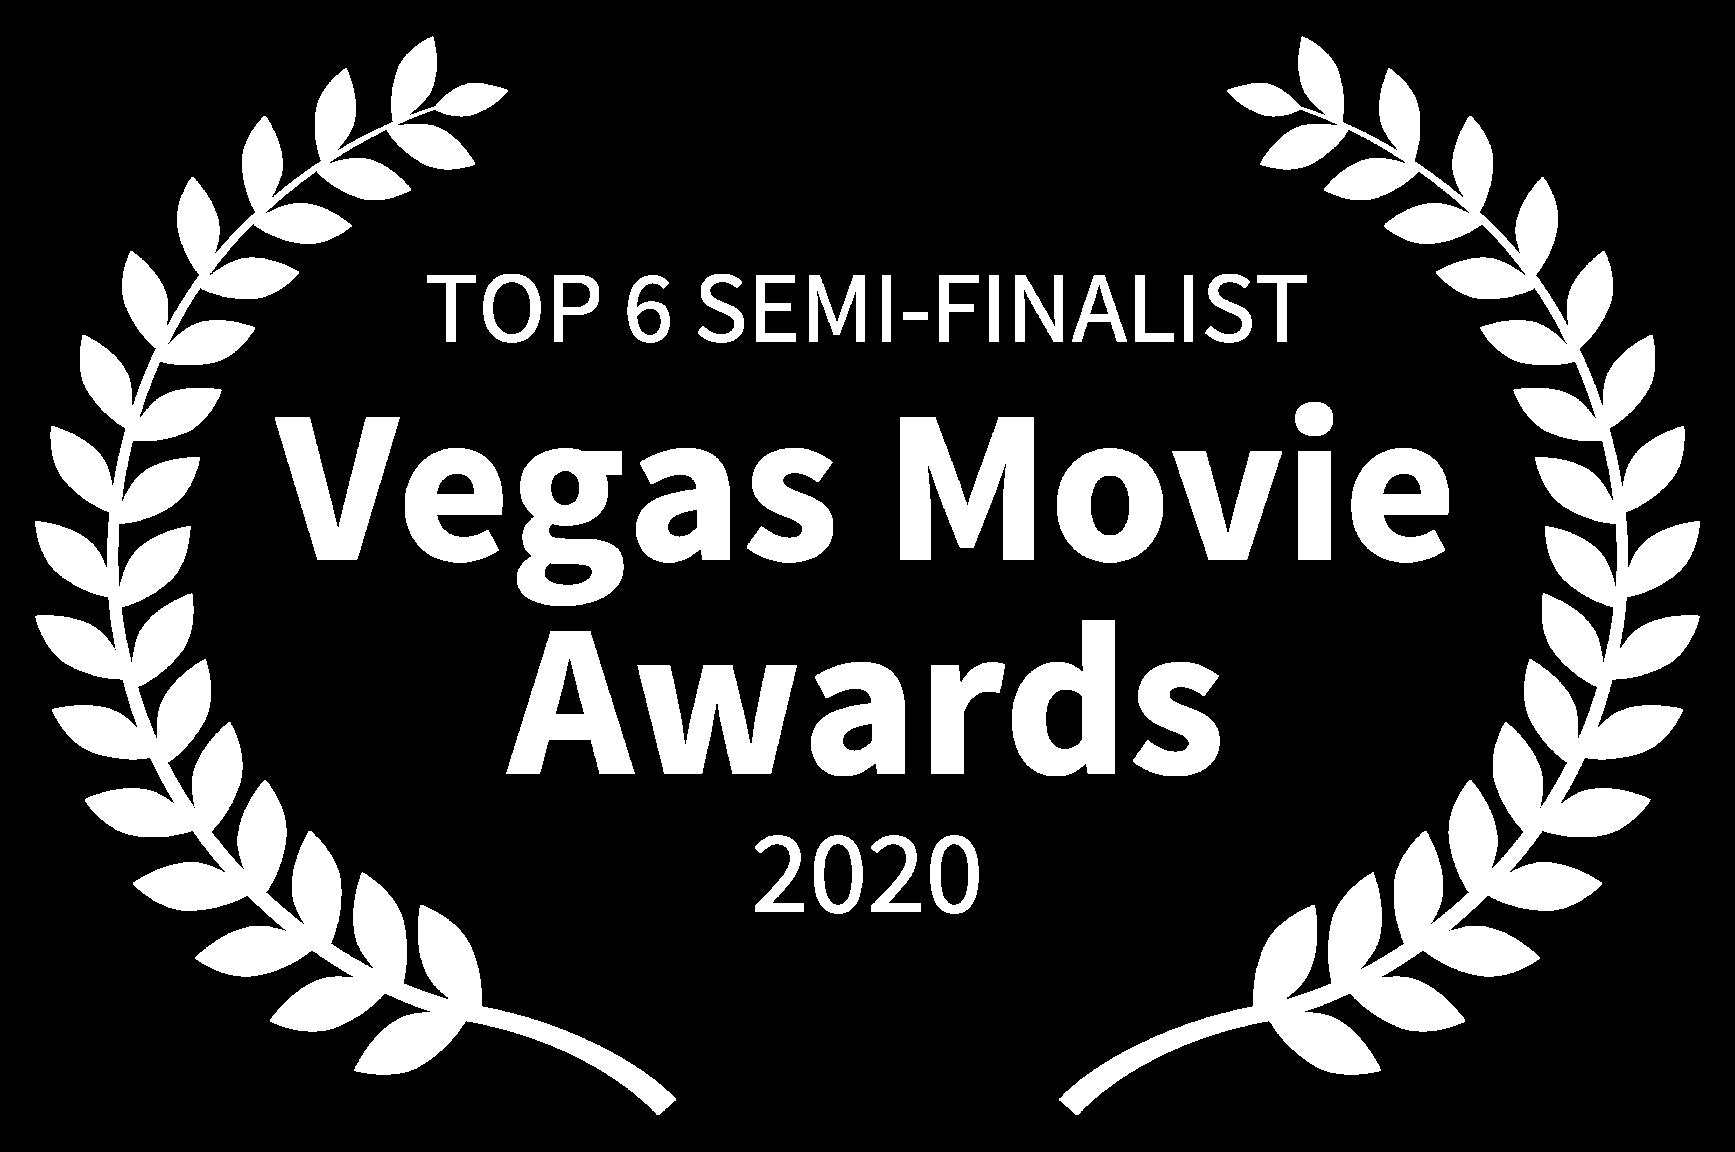 TOP 6 SEMI-FINALIST - Vegas Movie Awards - 2020